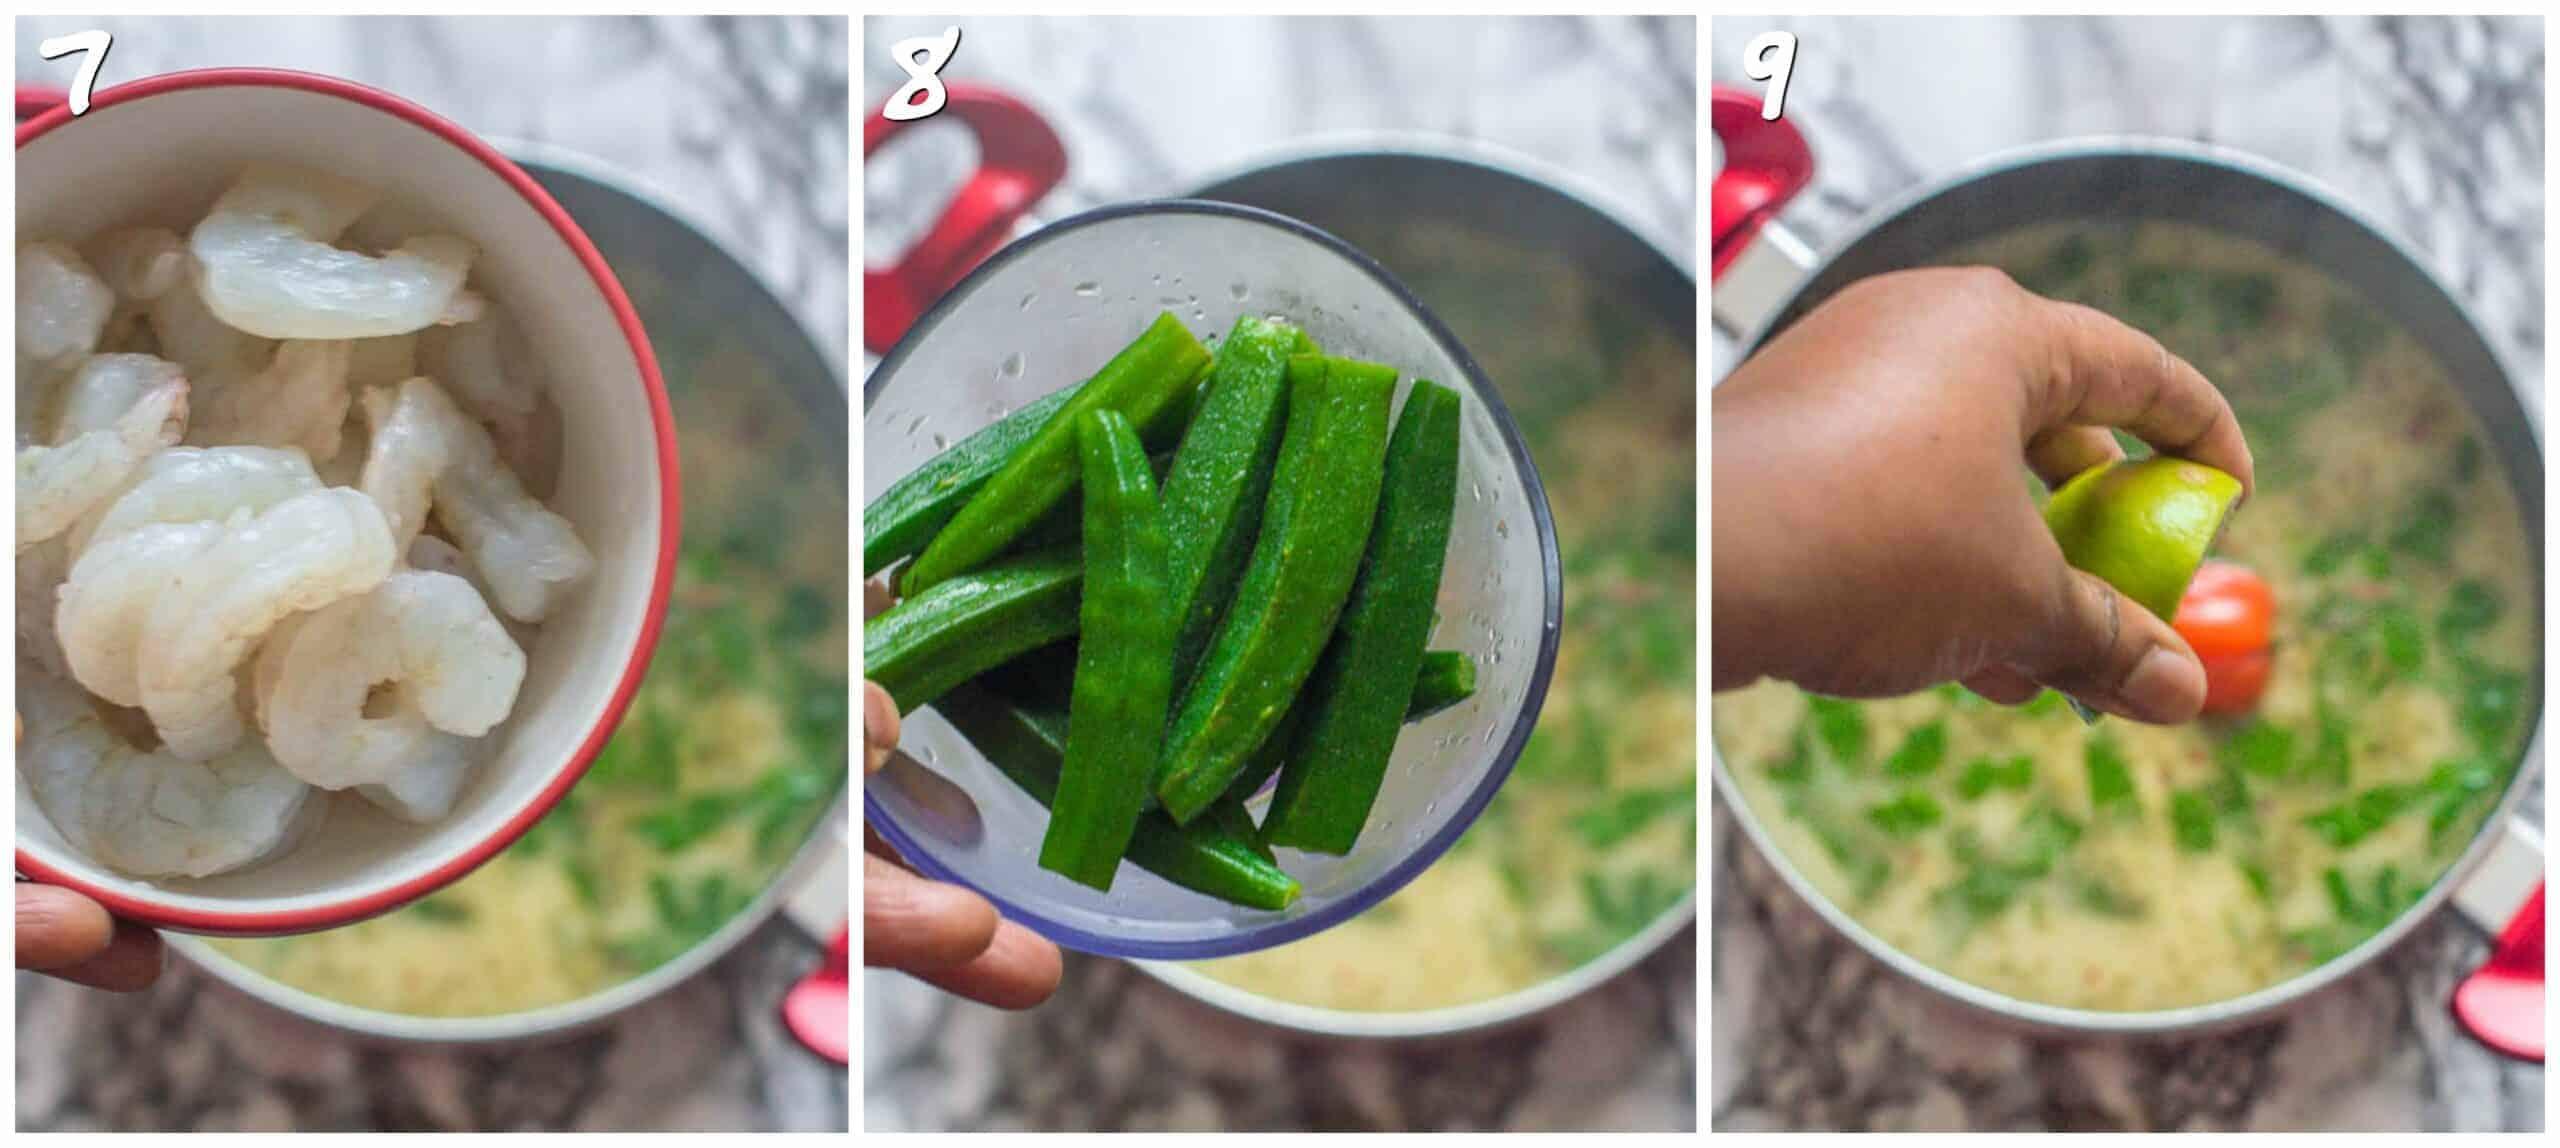 steps 7-9 adding prawns, okra and lime